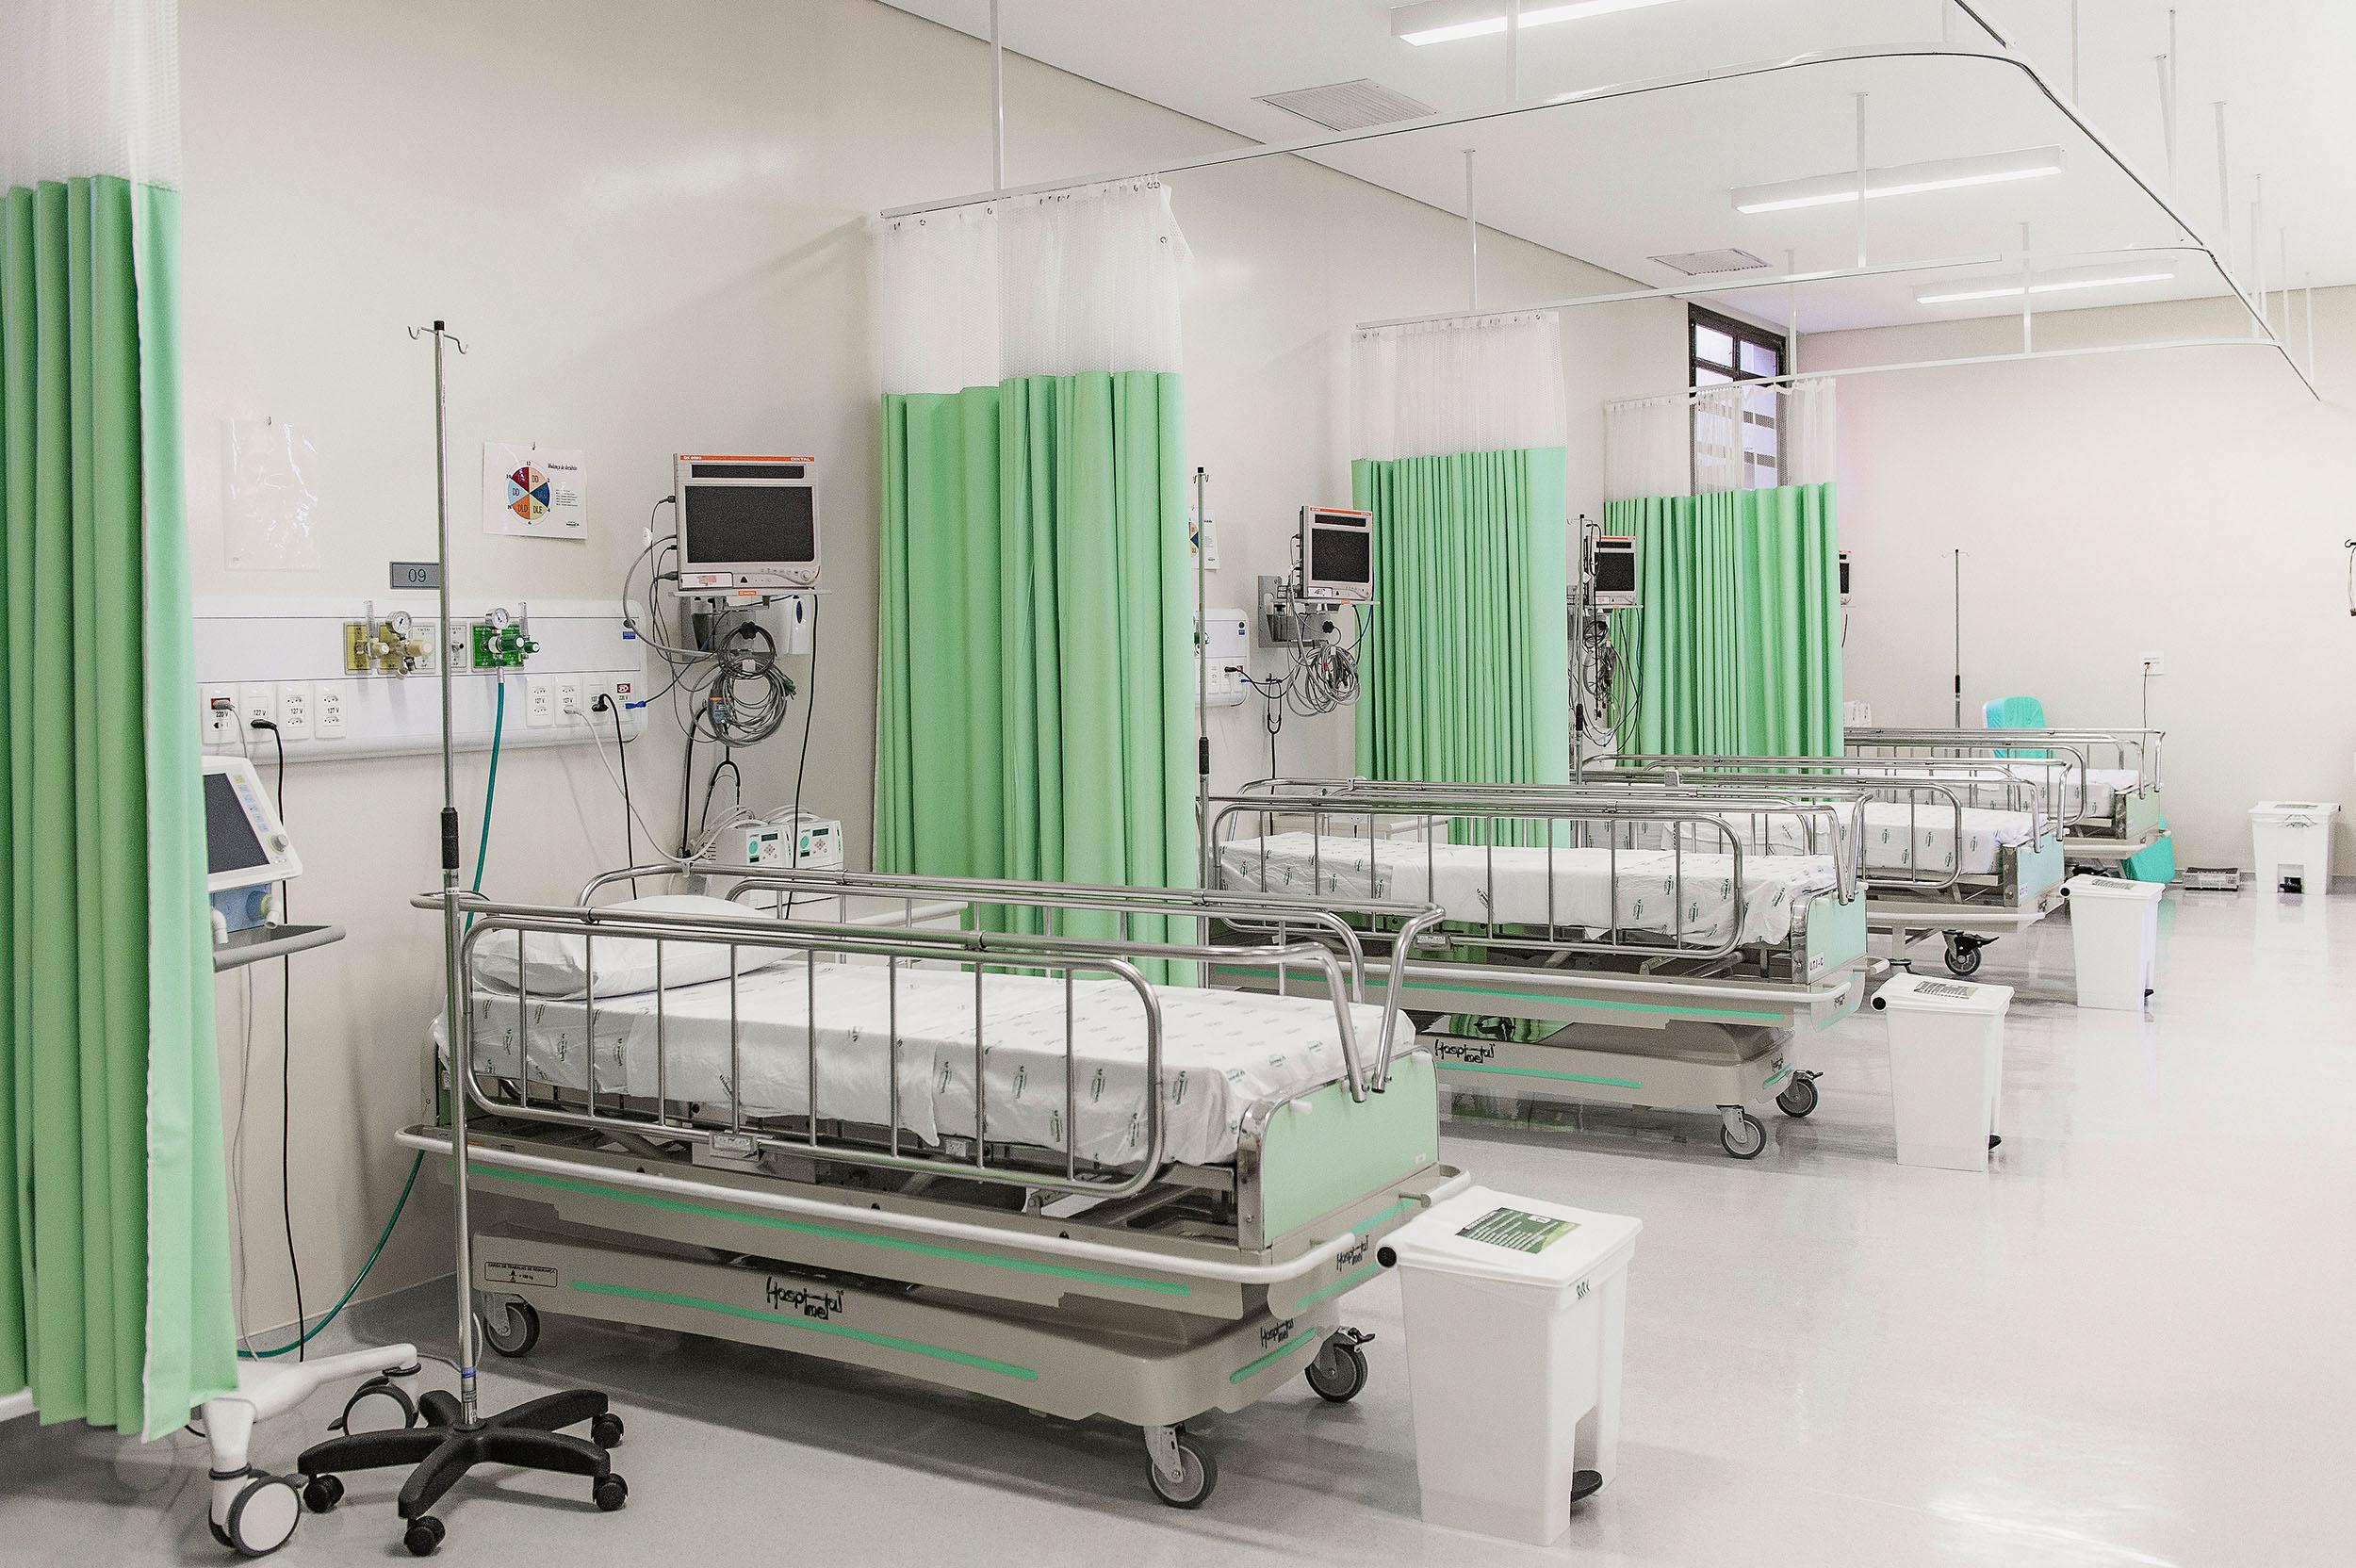 U.T.I. Cardiológica - Unimed de Araçatuba